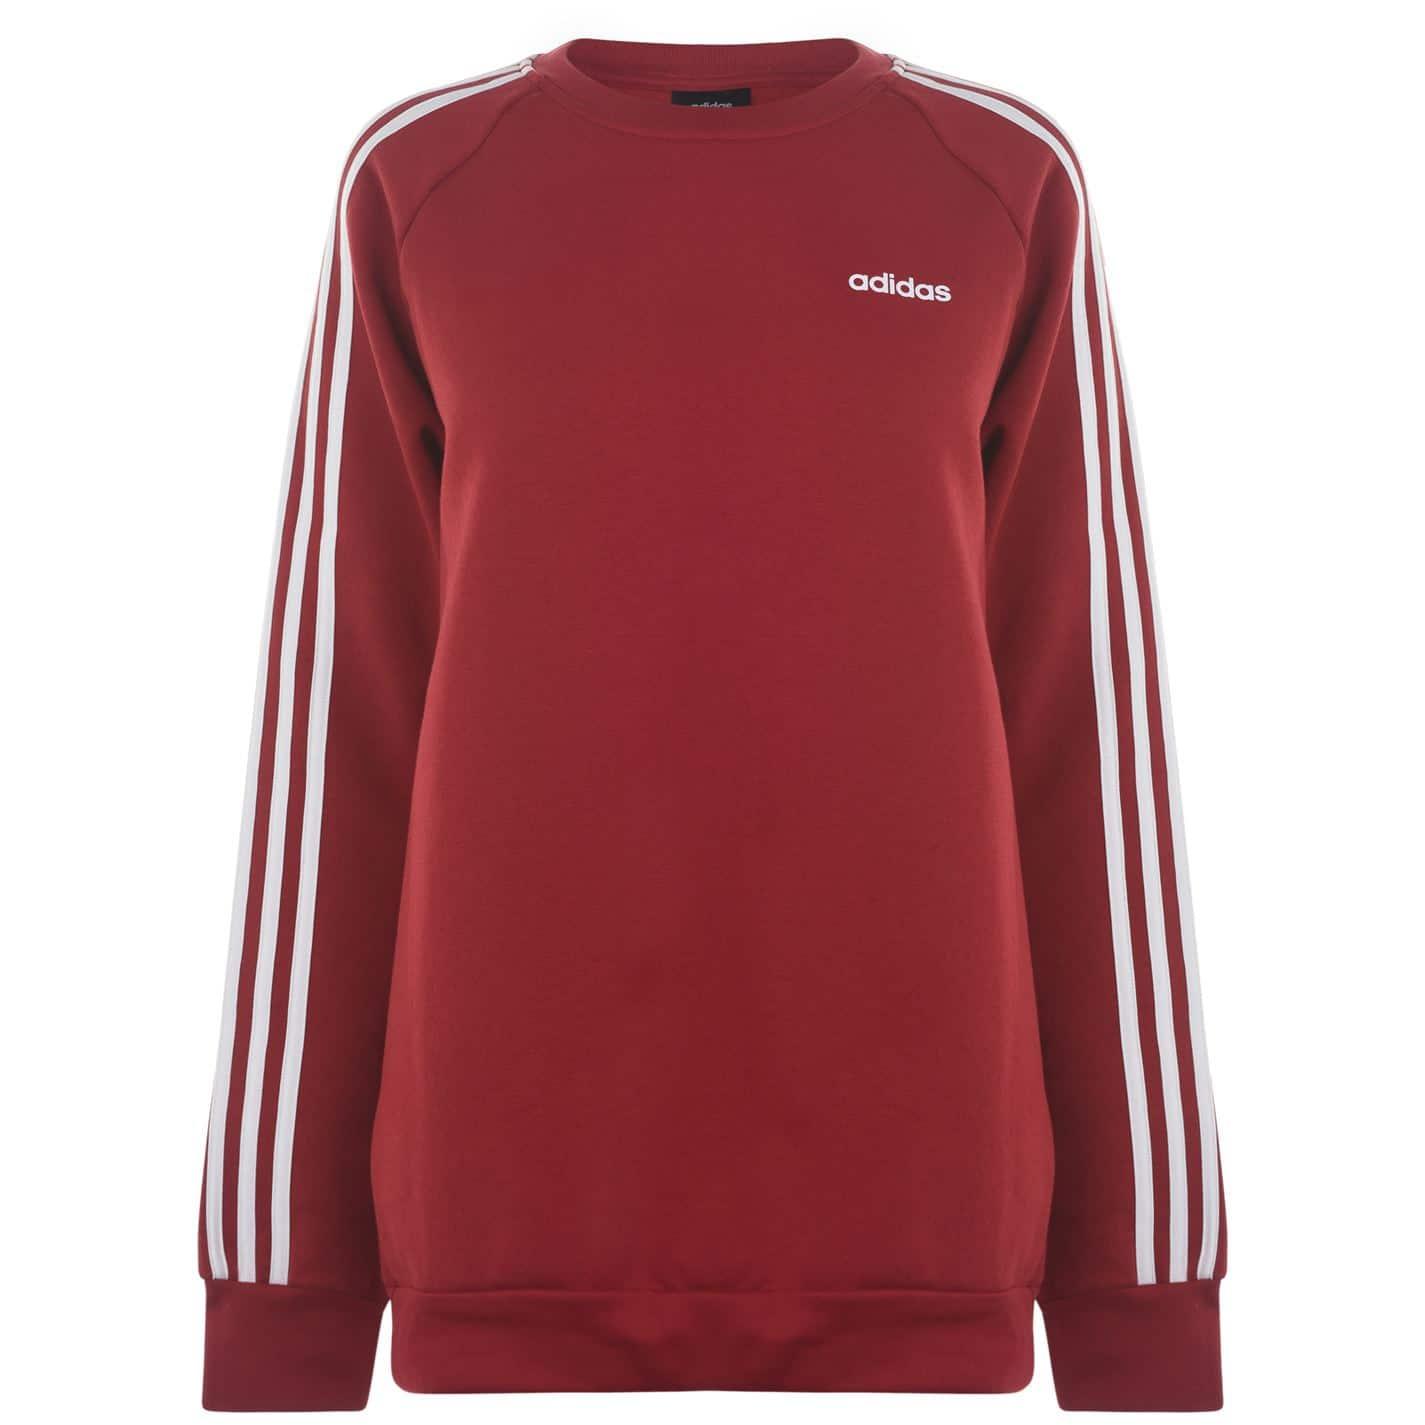 Adidas 3S Crew Sweater Ladies